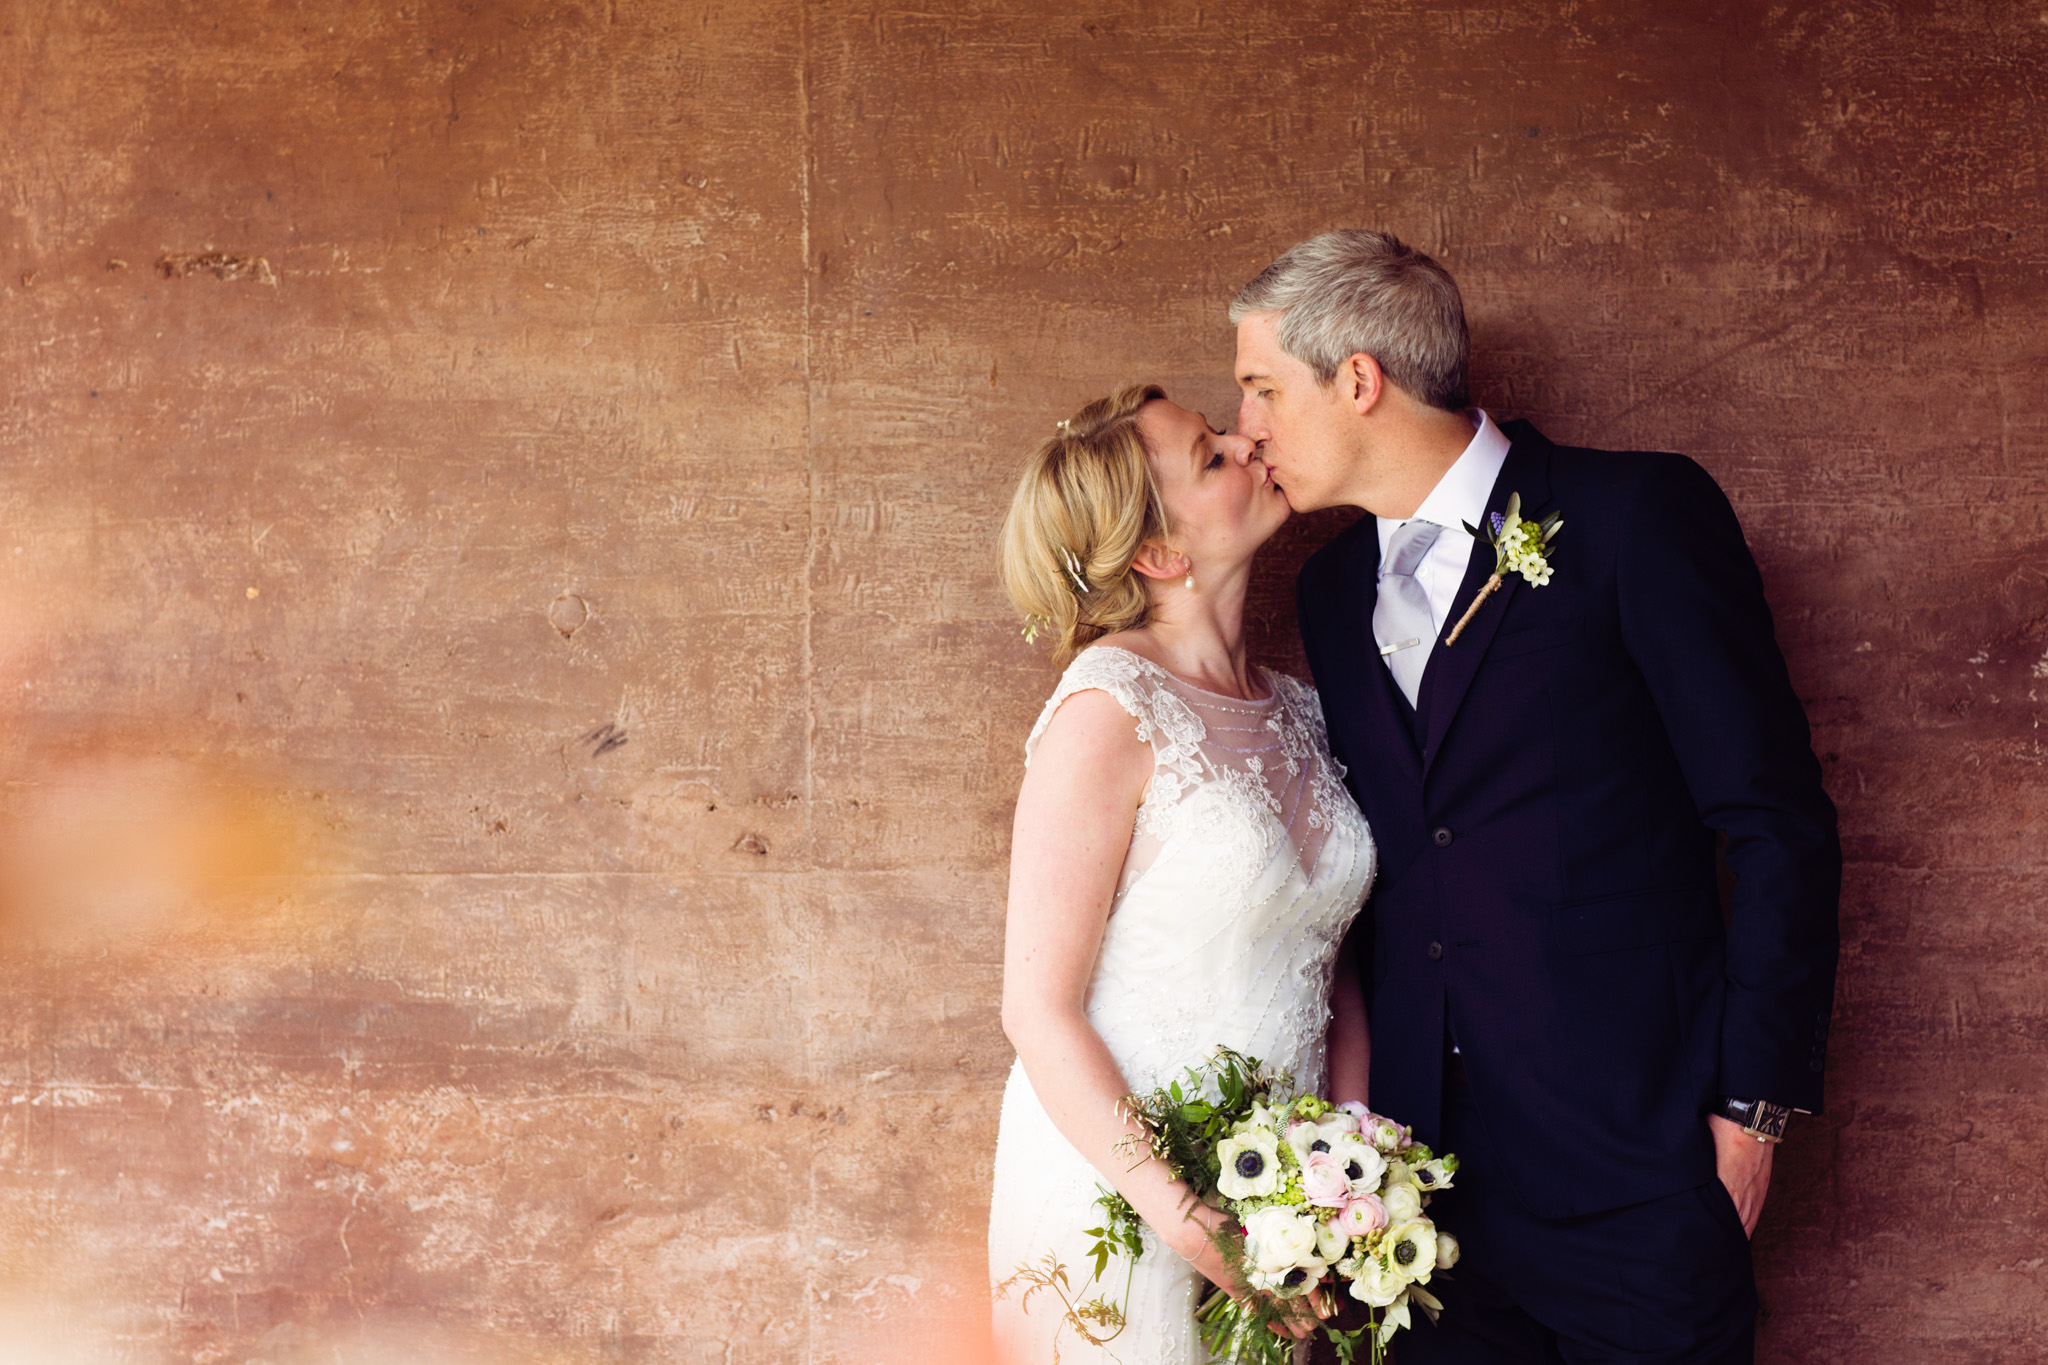 Mark_Barnes_Gloucester_Wedding_Photographer_Elmore_Court_Wedding_Photography_Mike+Kelly-77.jpg